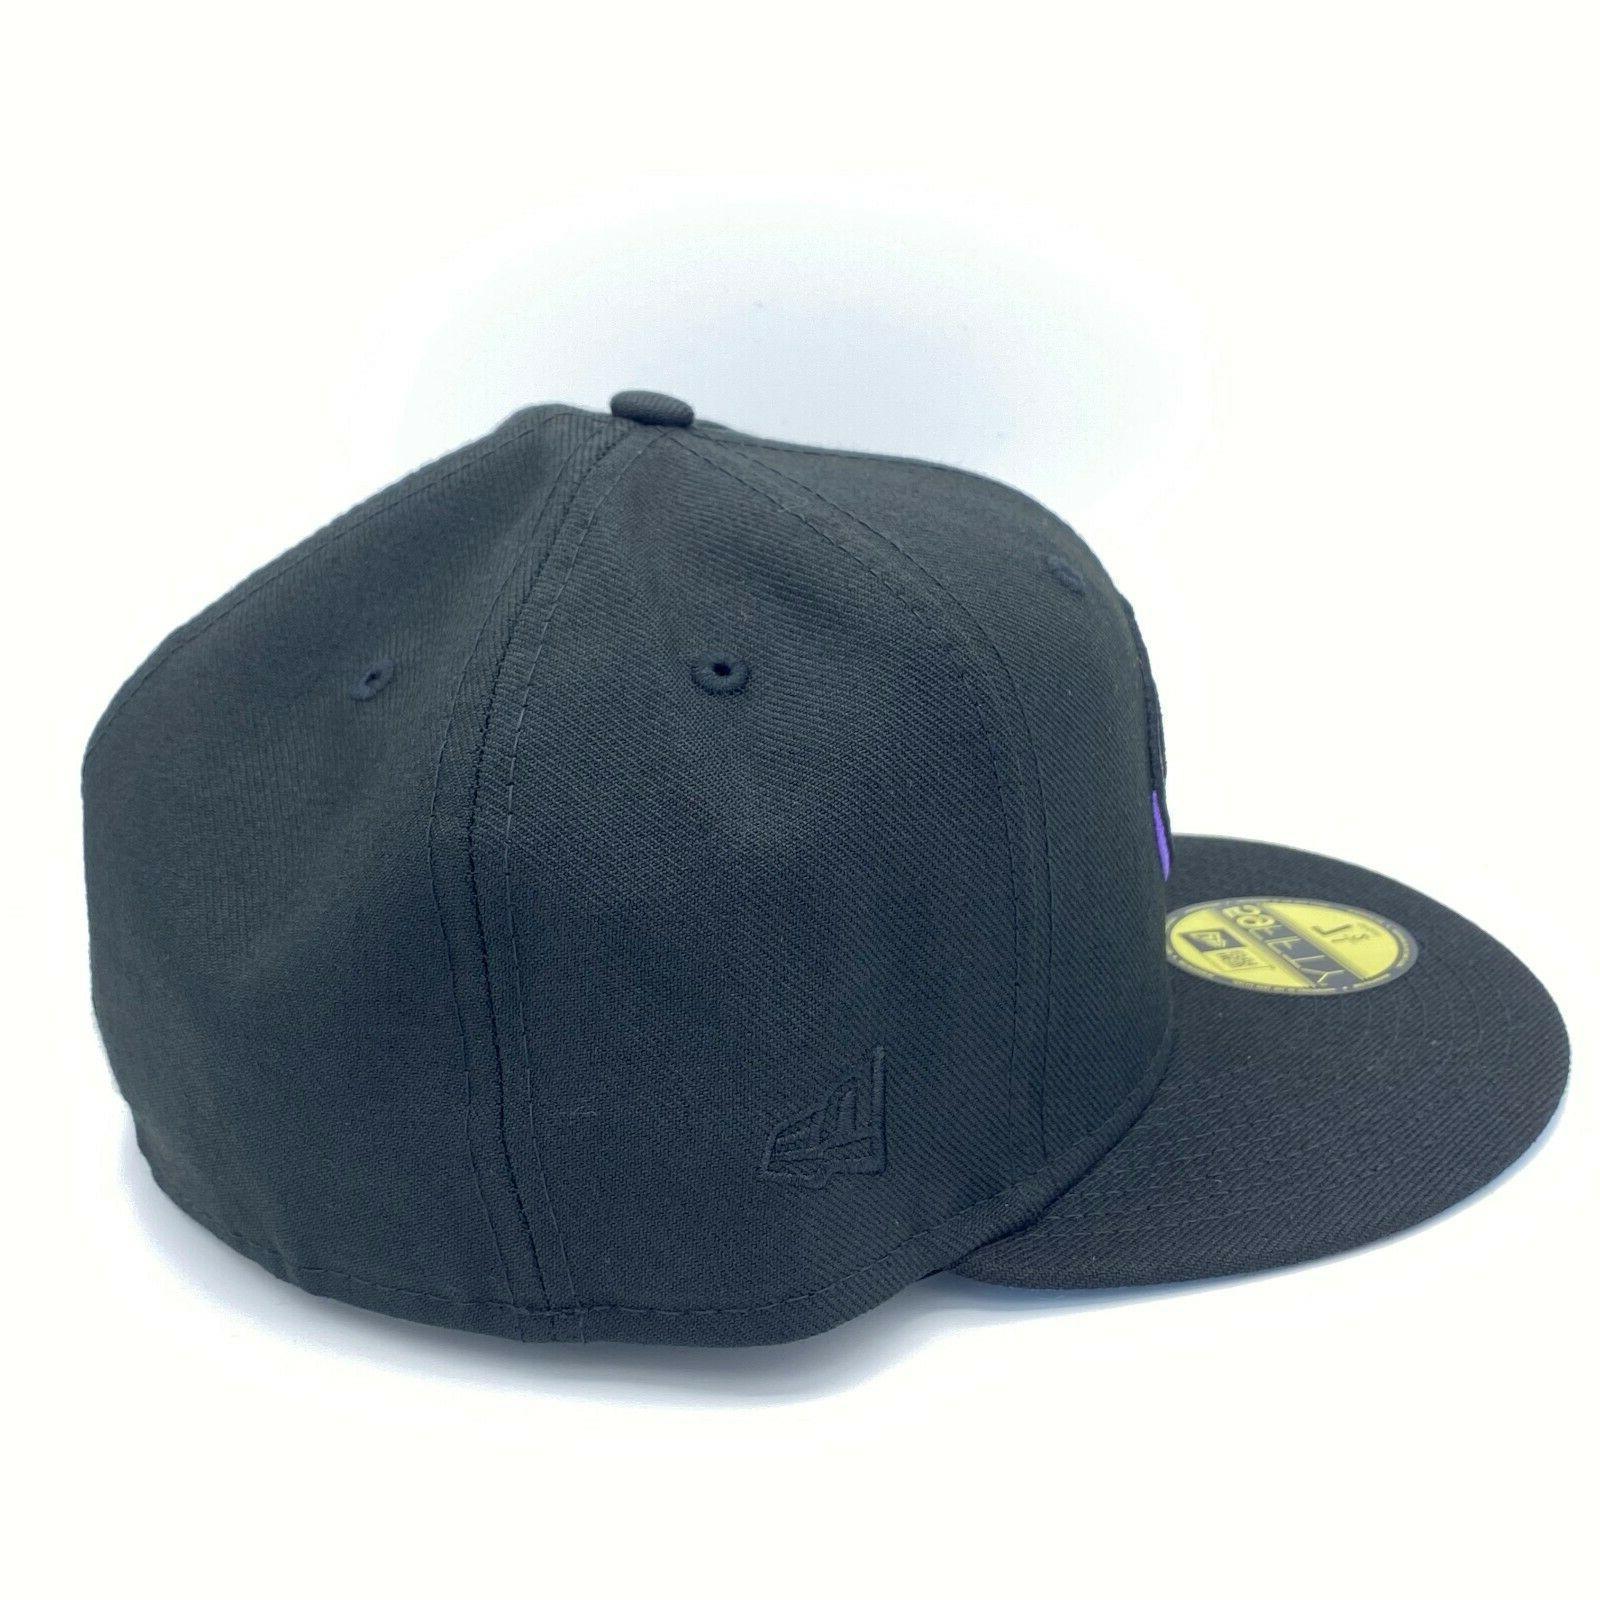 Arizona Diamondbacks Series Black Fitted Hat Bottom